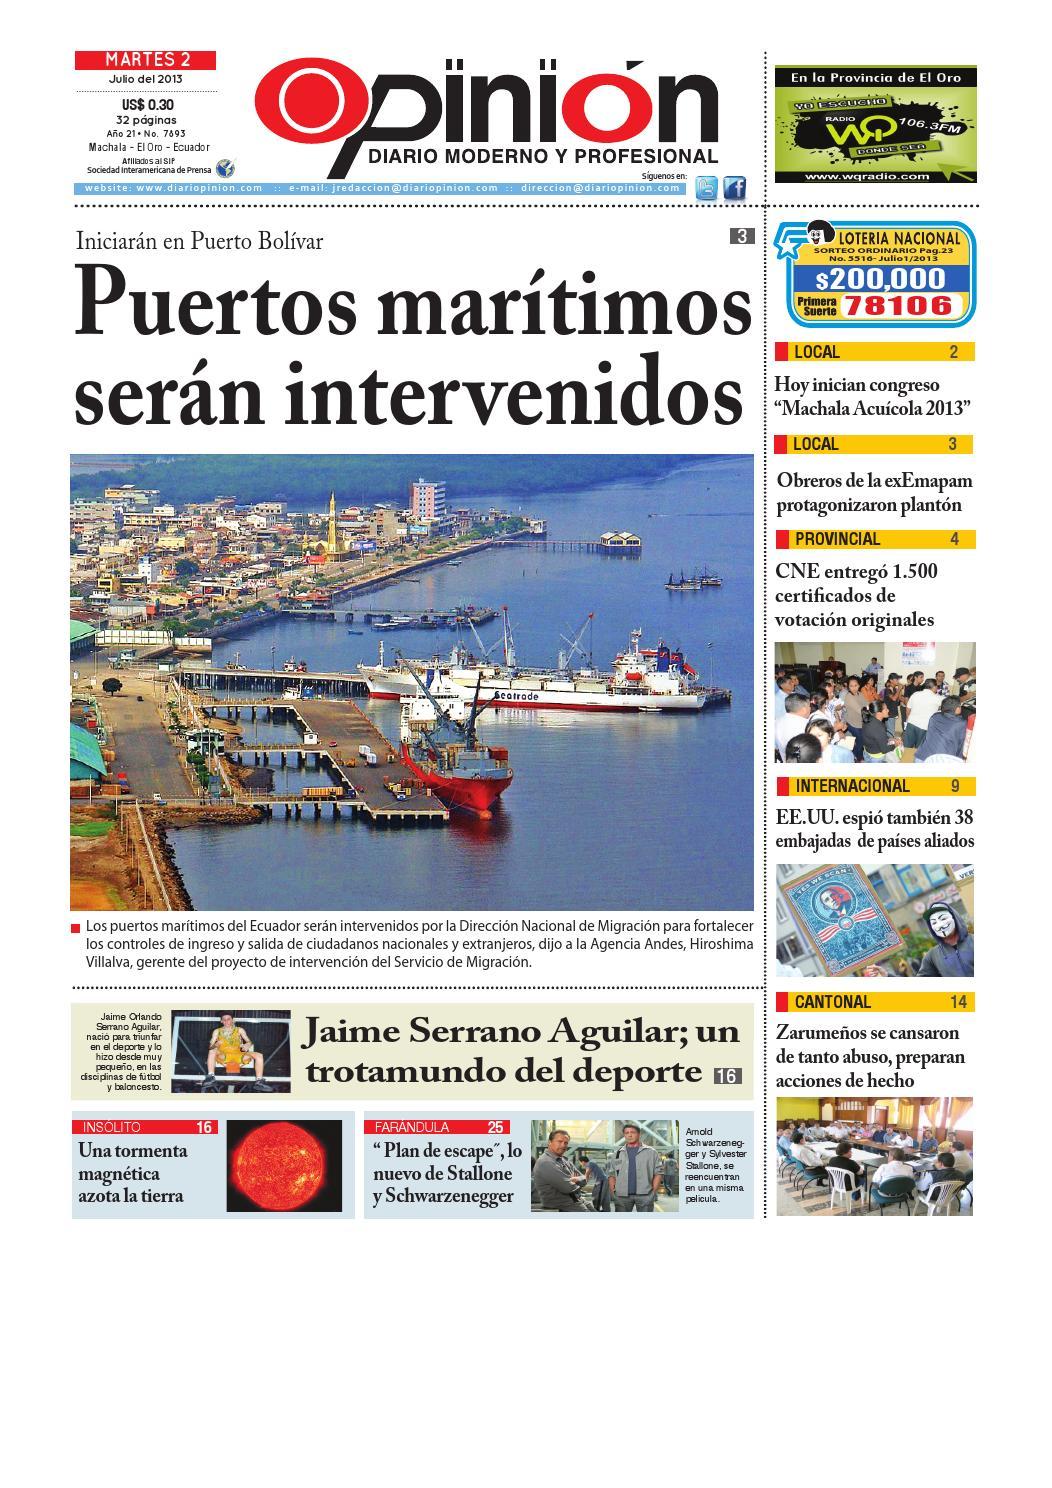 Impreso 02 07 13 by Diario Opinion - issuu